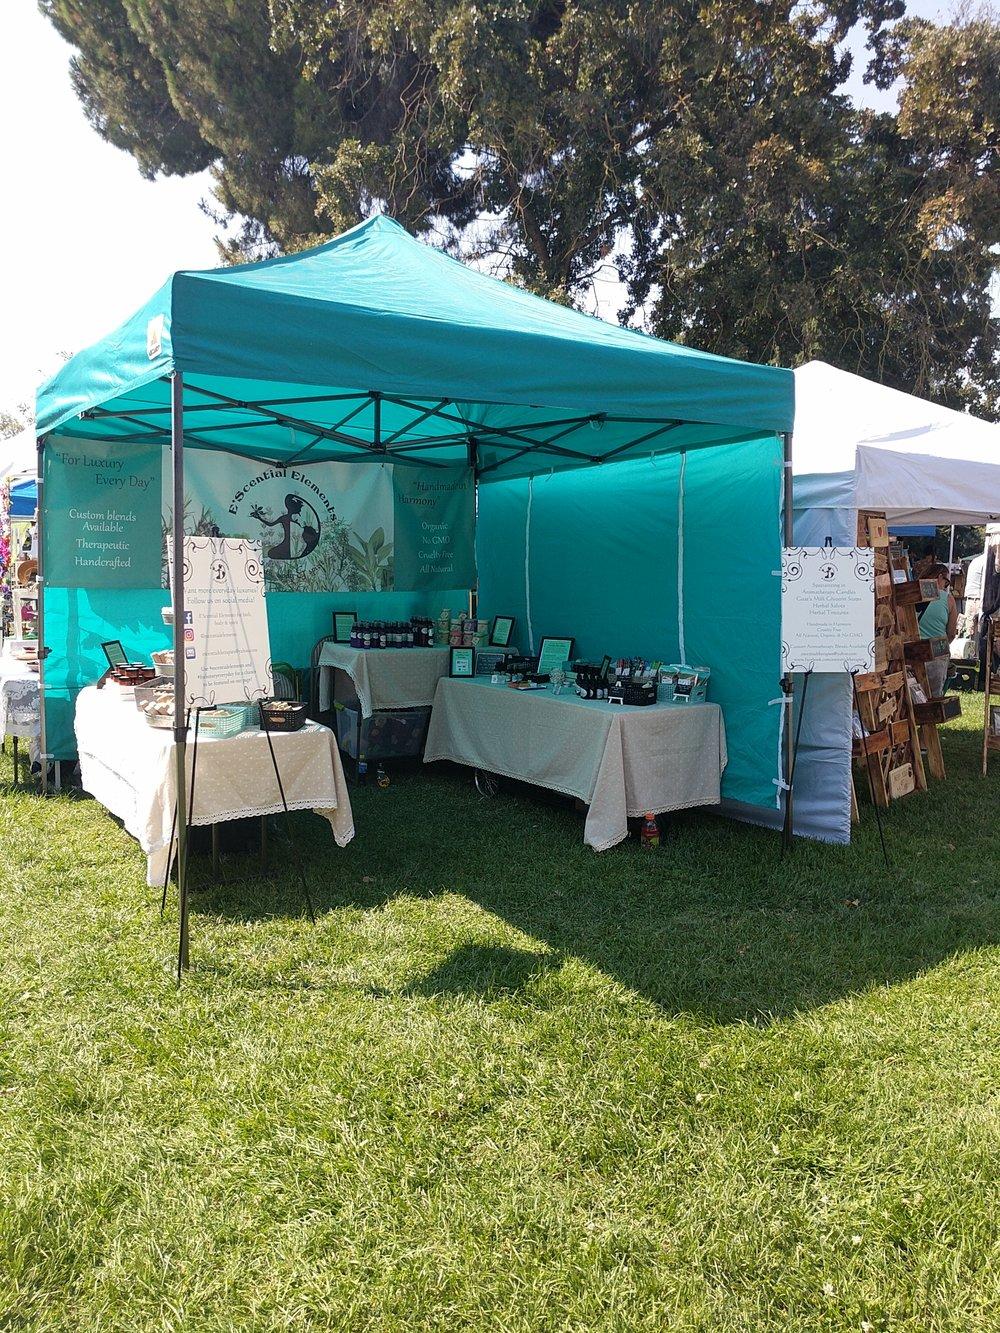 August 2017 StockMarket, Caldwell Park, Stockton, CA